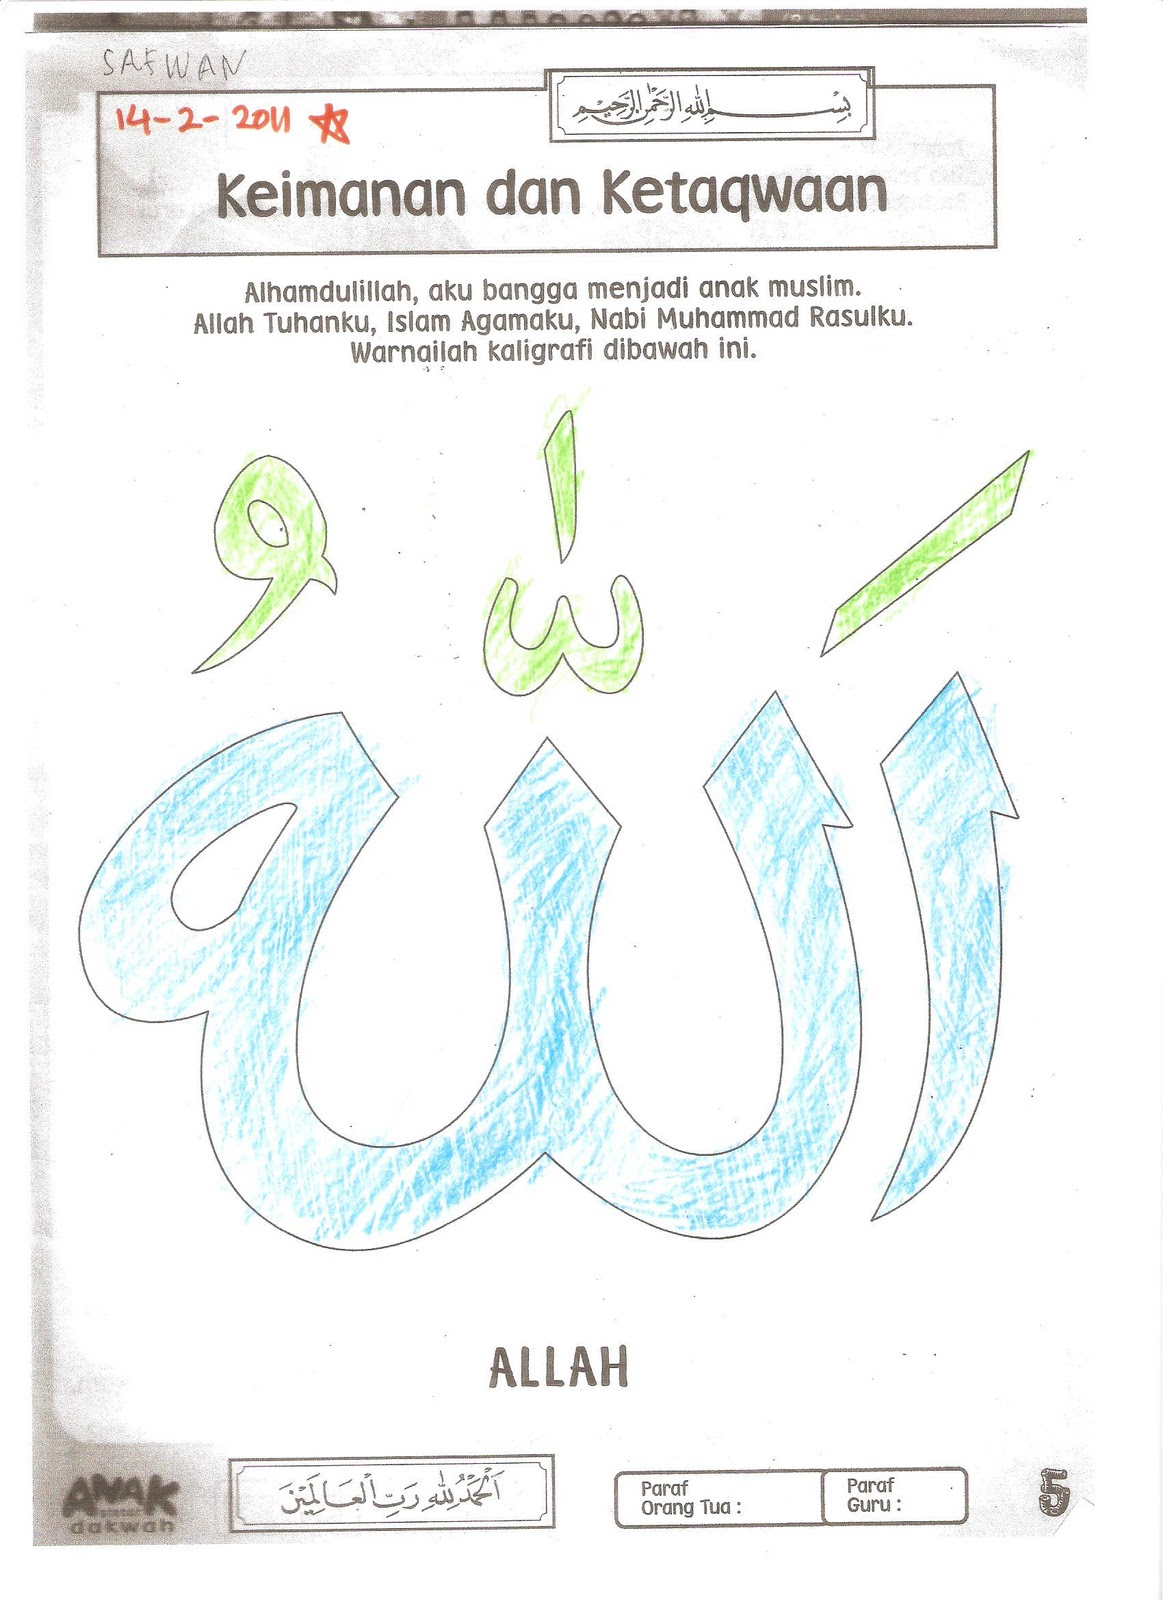 Hasil Lomba Mewarnai Kaligrafi dlm rangka Maulid Nabi Muhammad SAW by Safwan